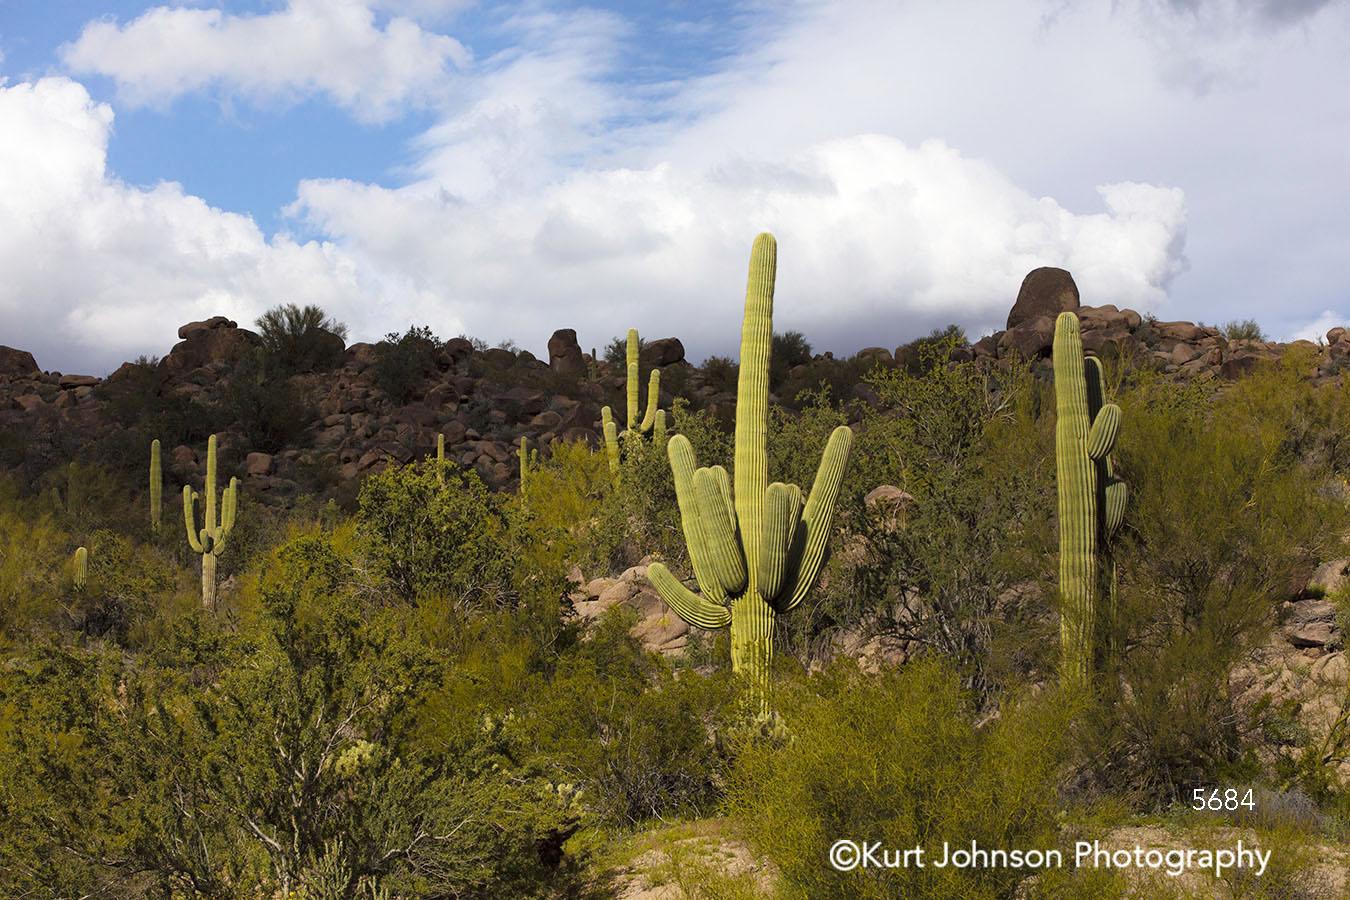 arizona southwest desert landscape cacti cactus green field blue sky clouds indigenous